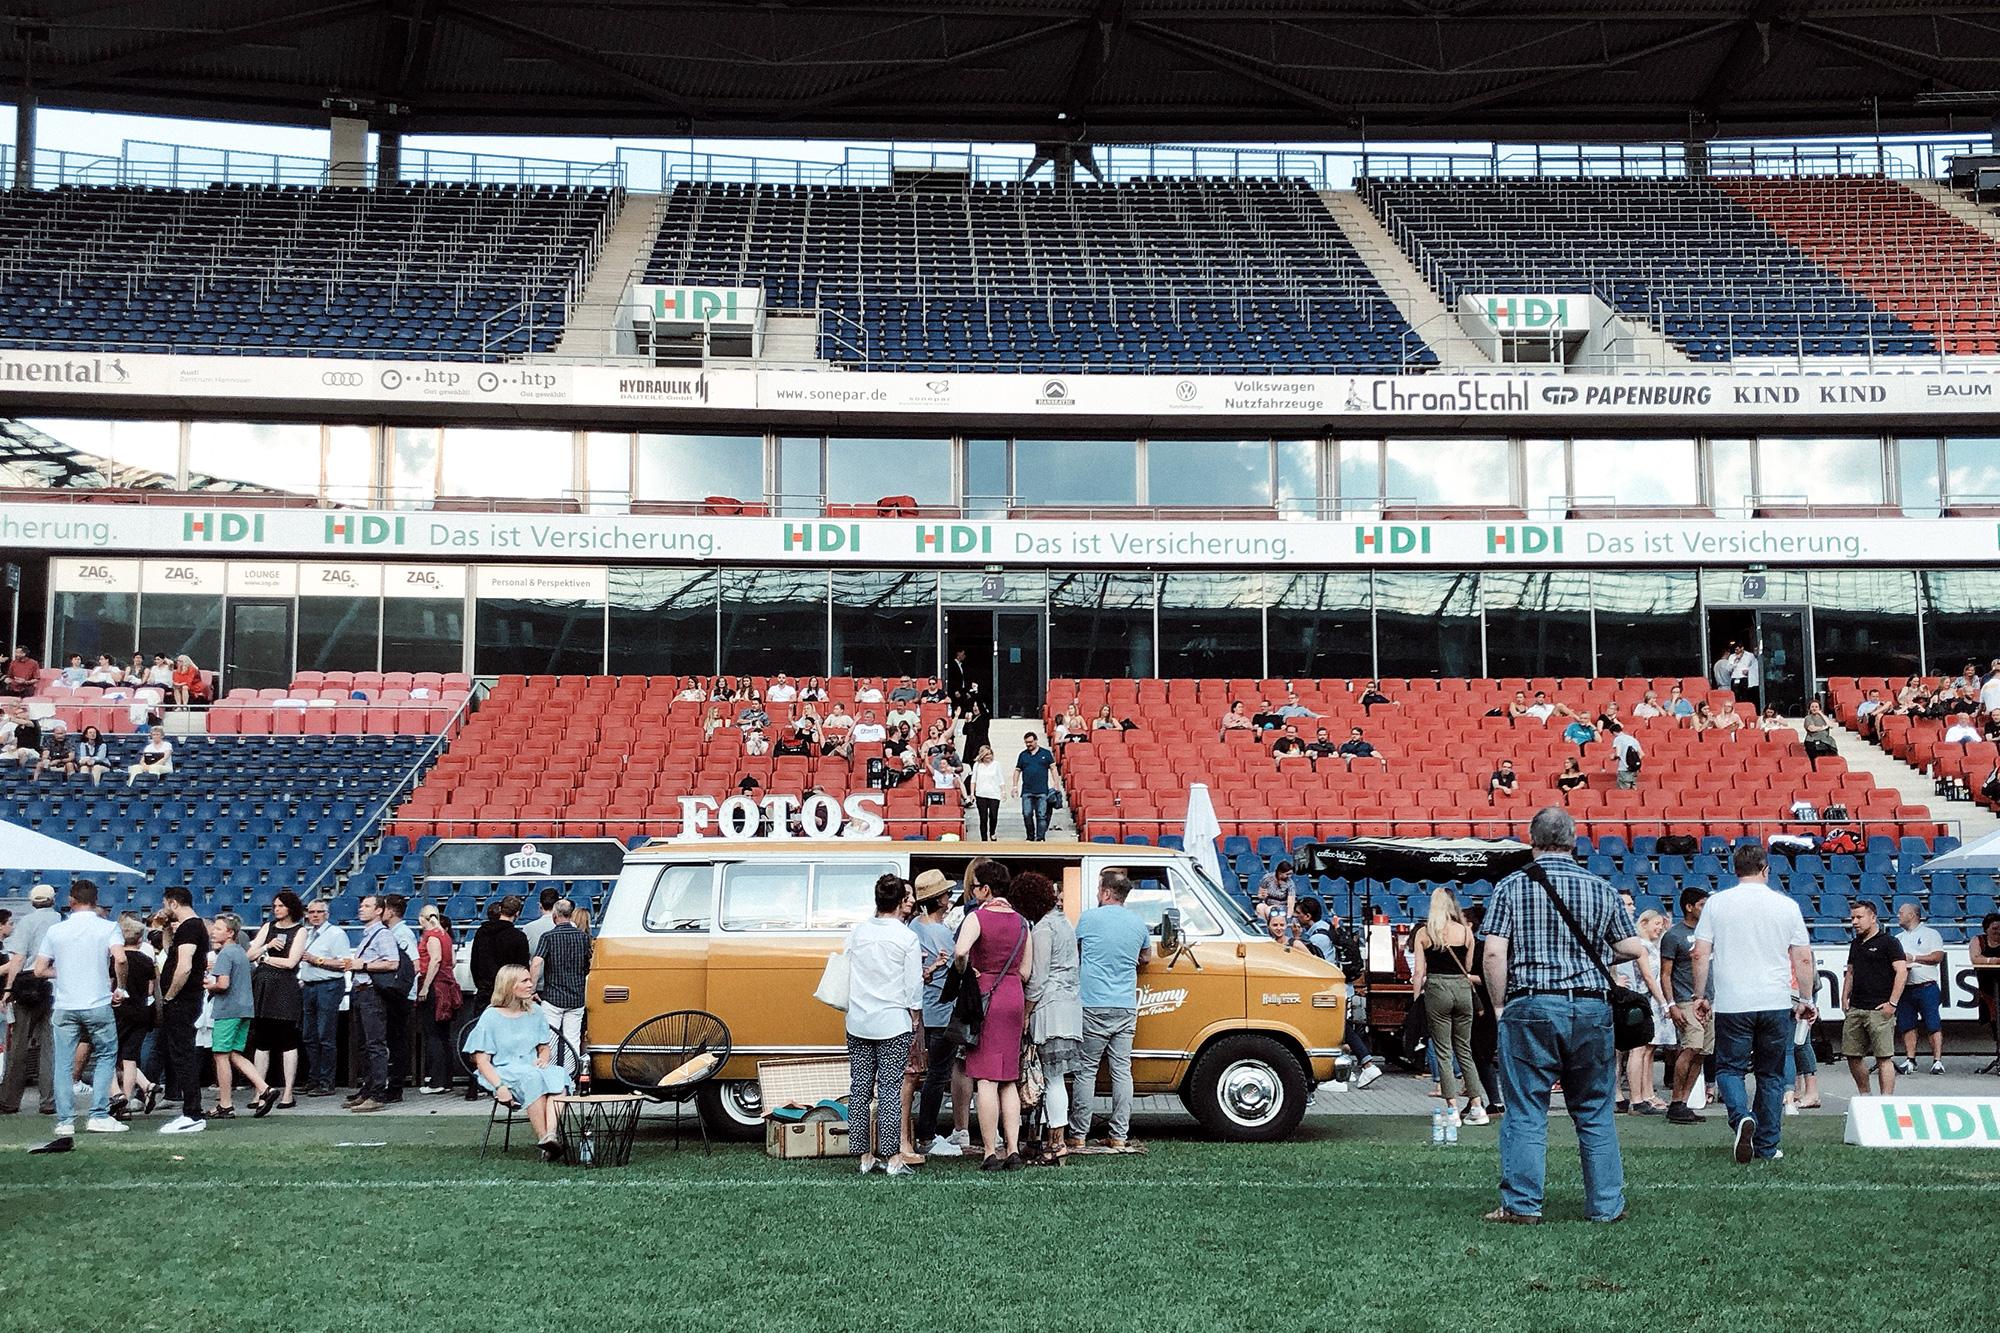 Fotobus-Jimmy-Fotobulli–Event-Fotobooth-V01.jpg